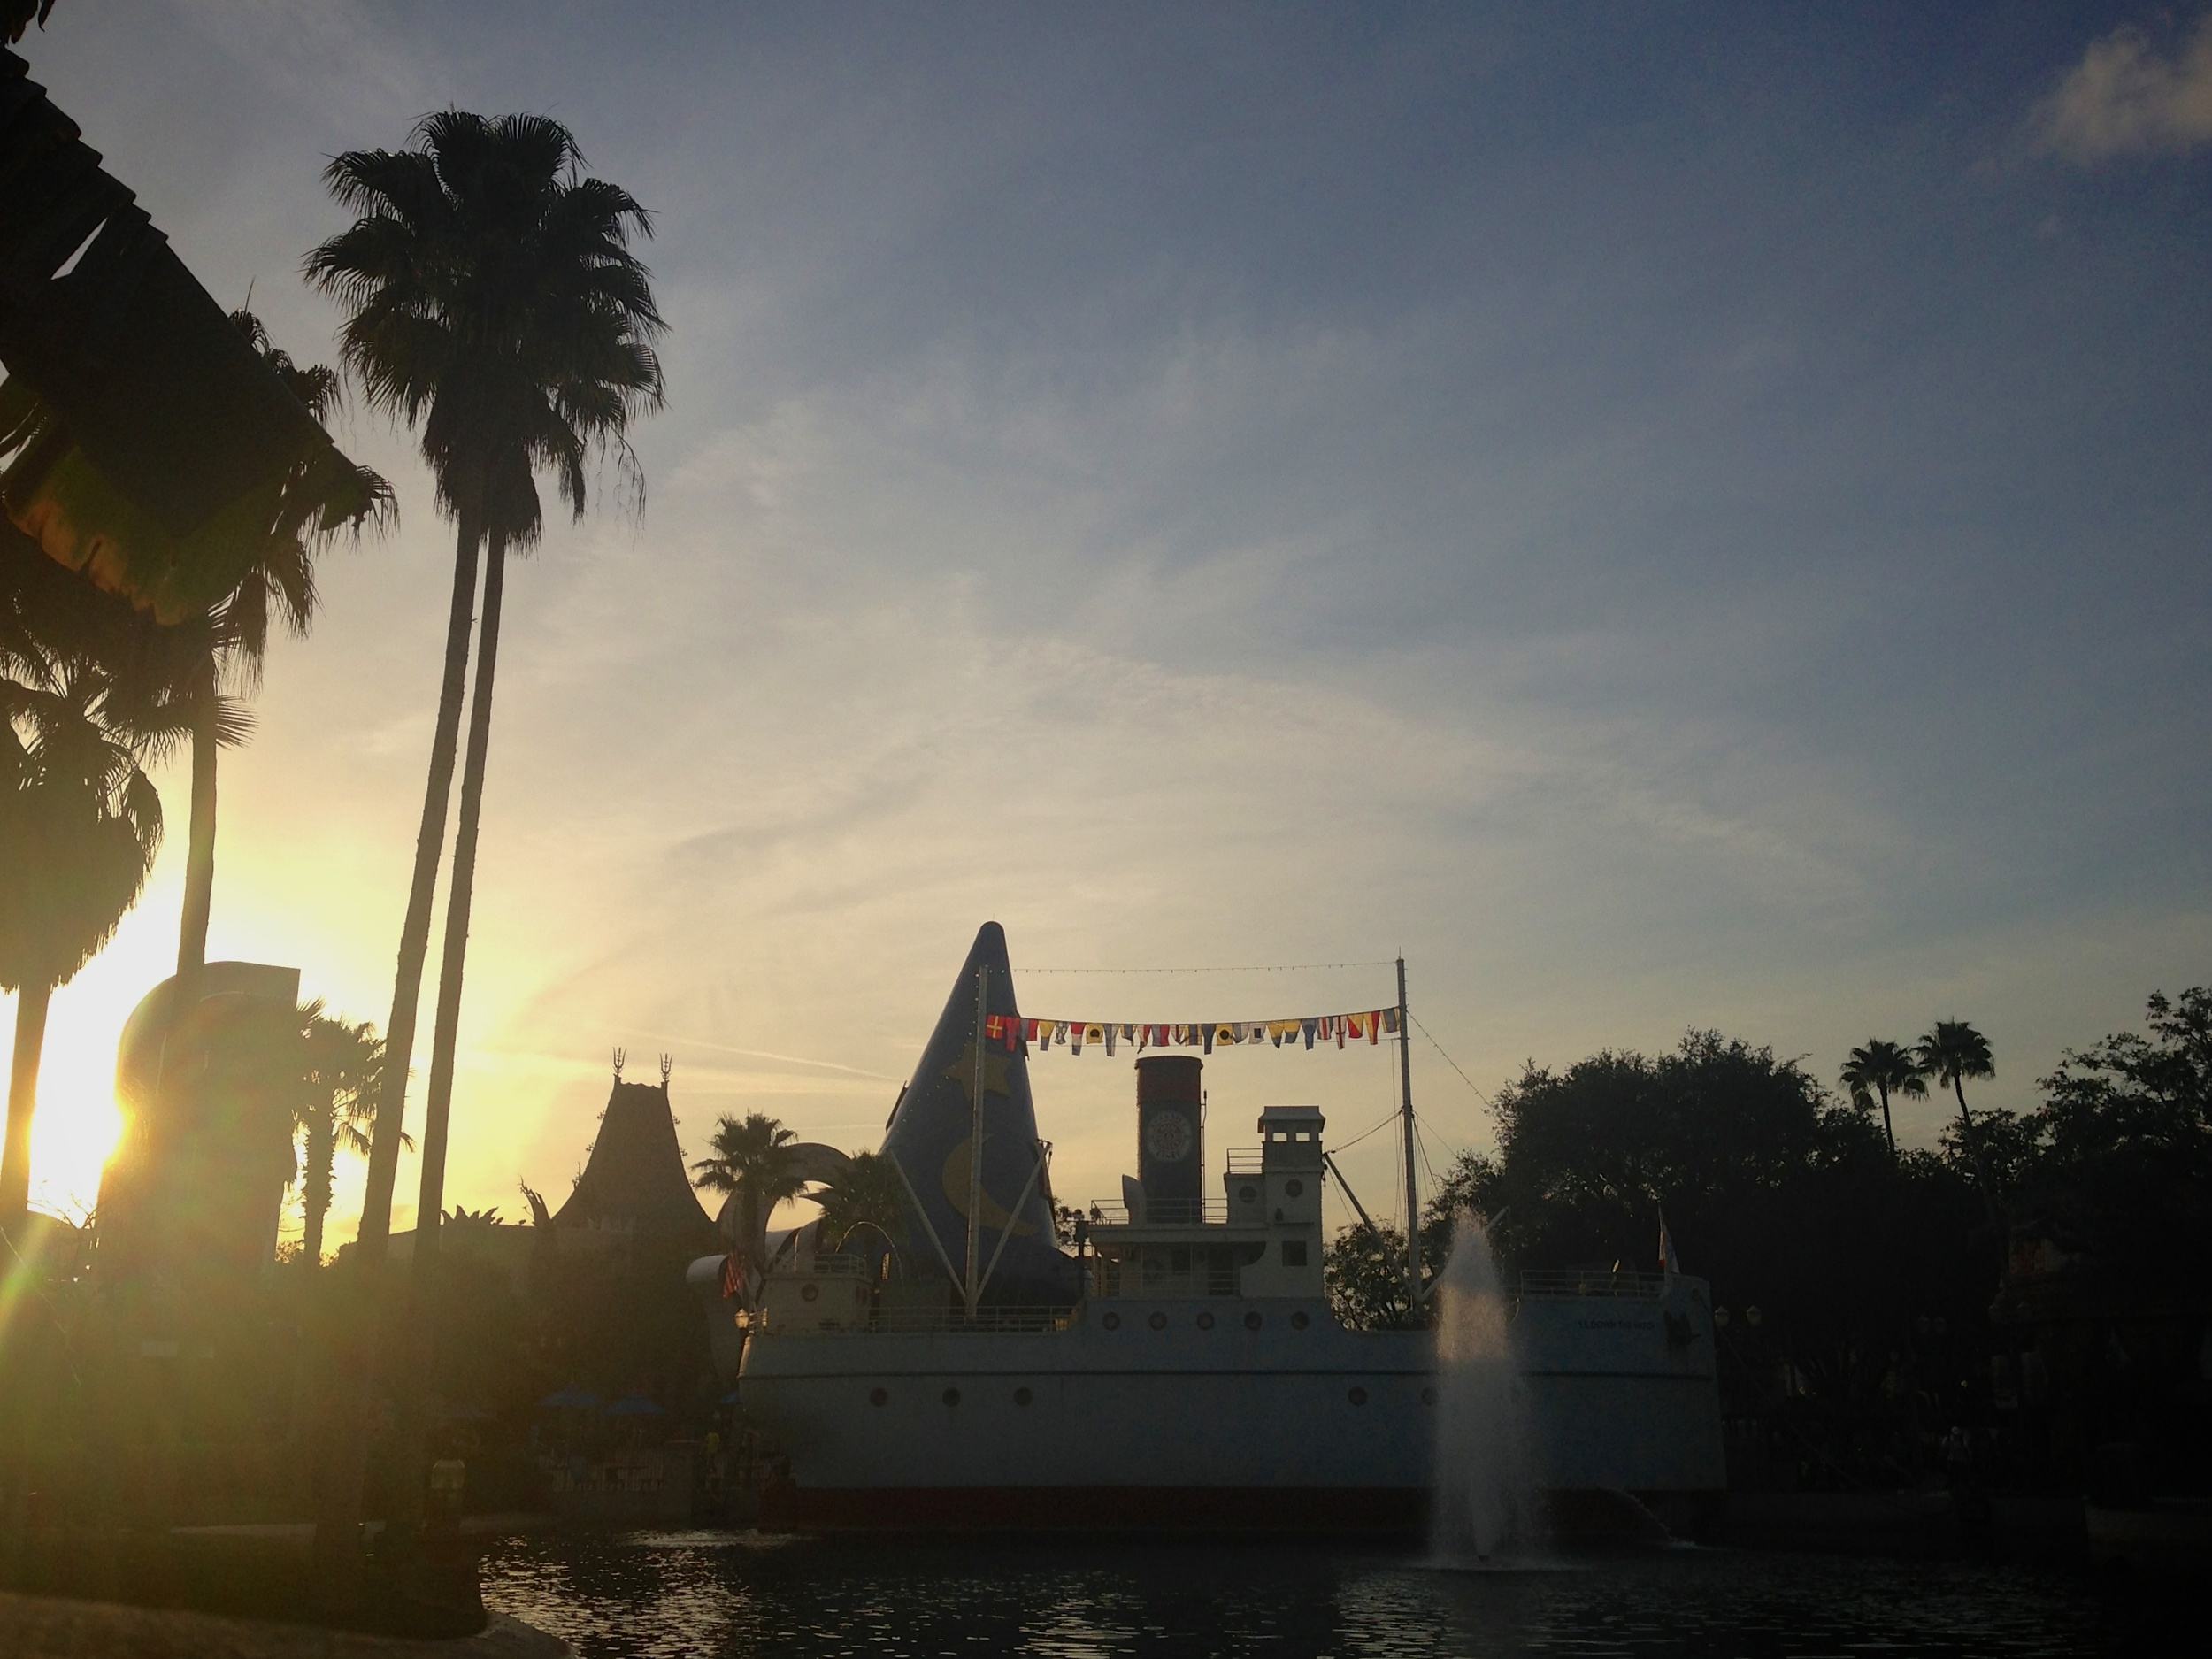 Dusk at Disney's Hollywood Studios.